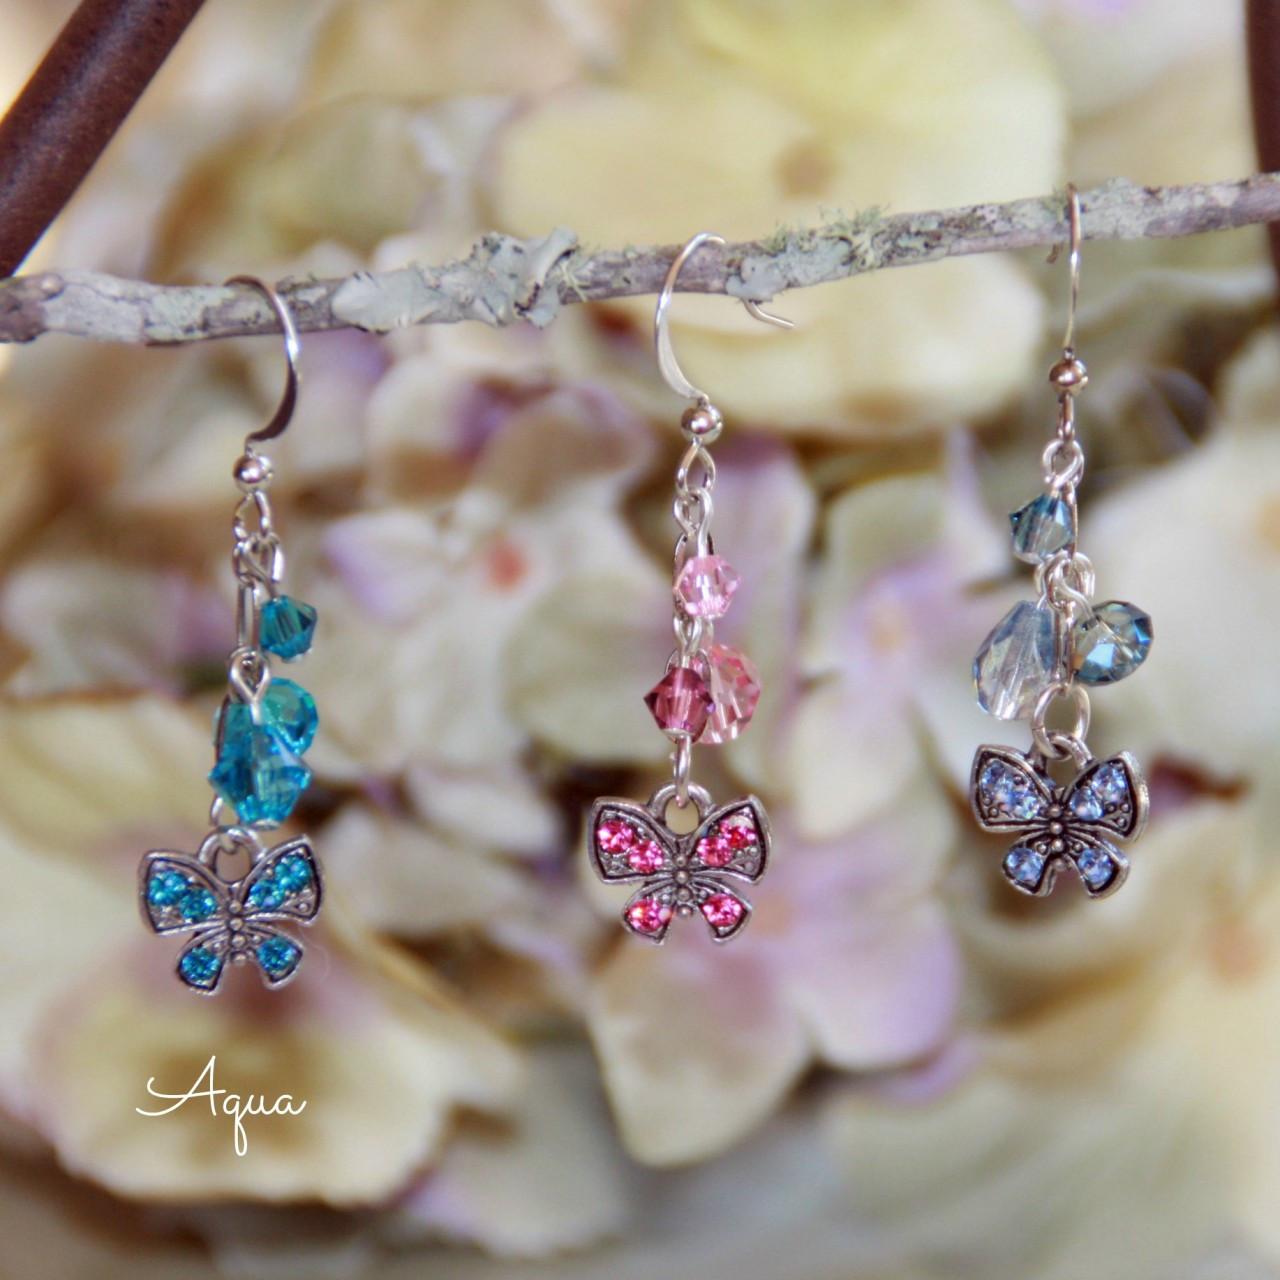 AER-27 Butterfly Crystal Earrings Aqua Swarovski